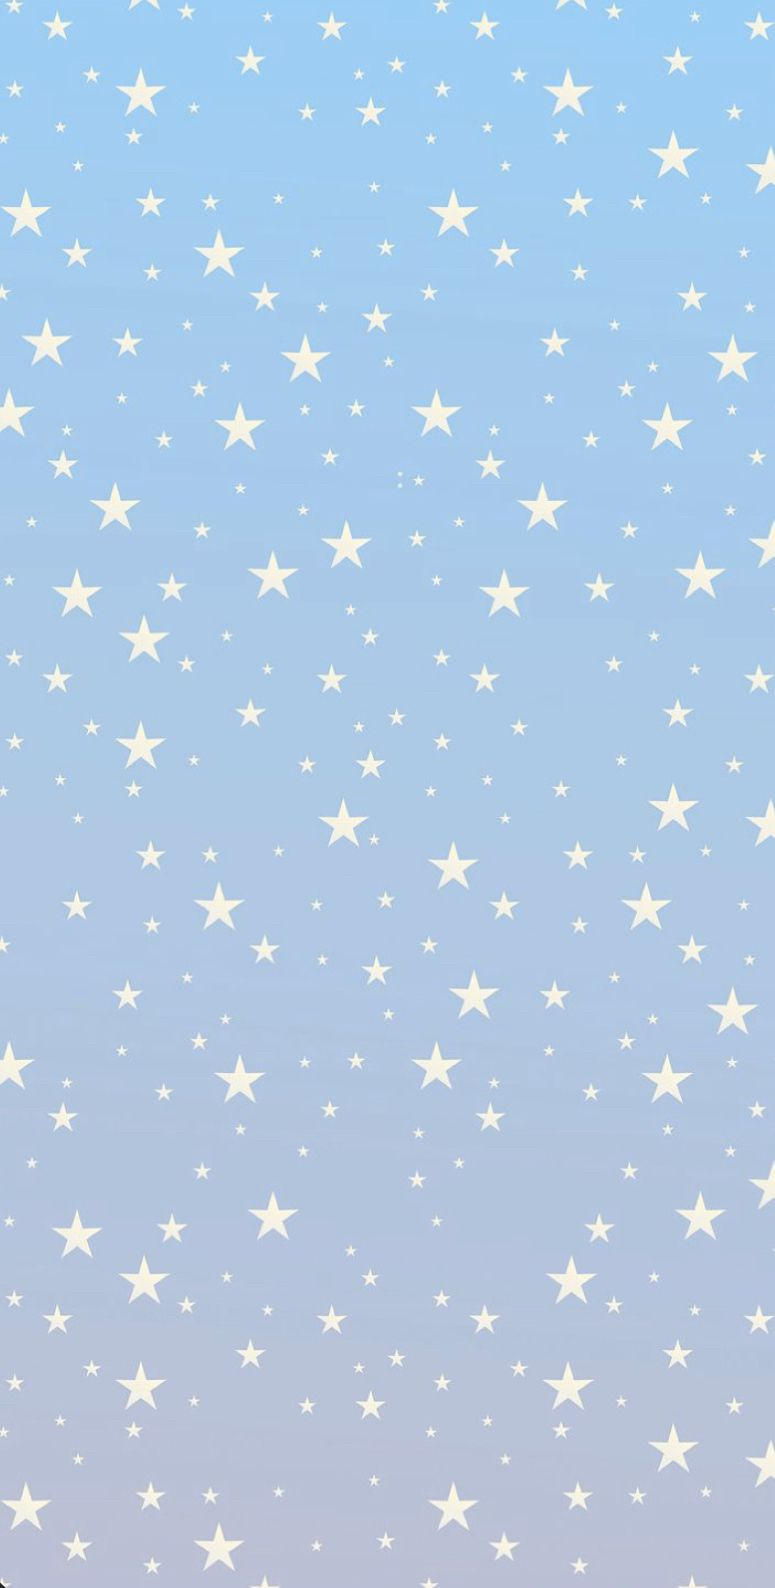 Aesthetic pastel ipad wallpaper blue